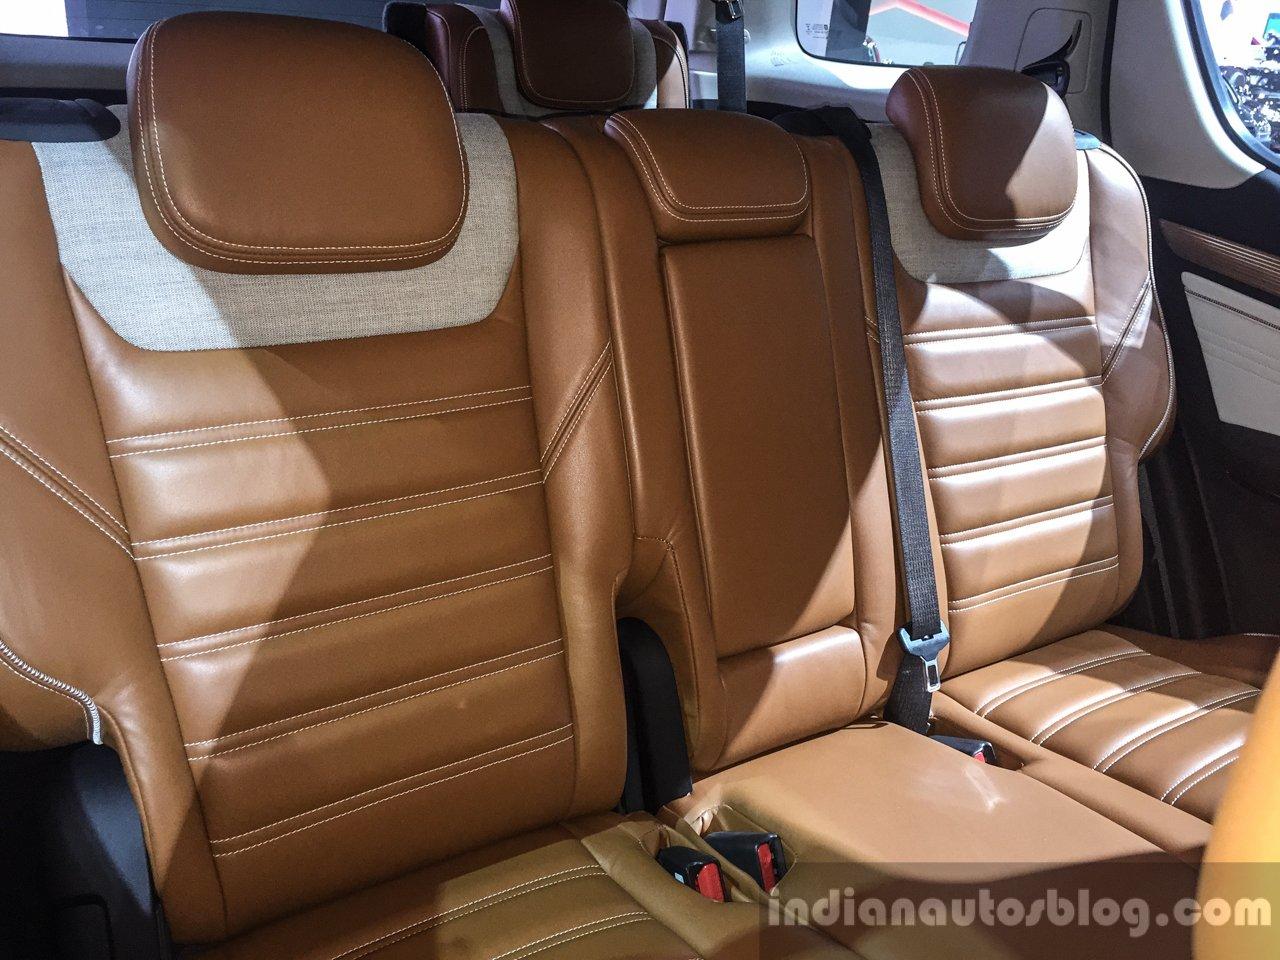 2016 Chevrolet Trailblazer Premier (facelift) rear seat back at 2016 BIMS